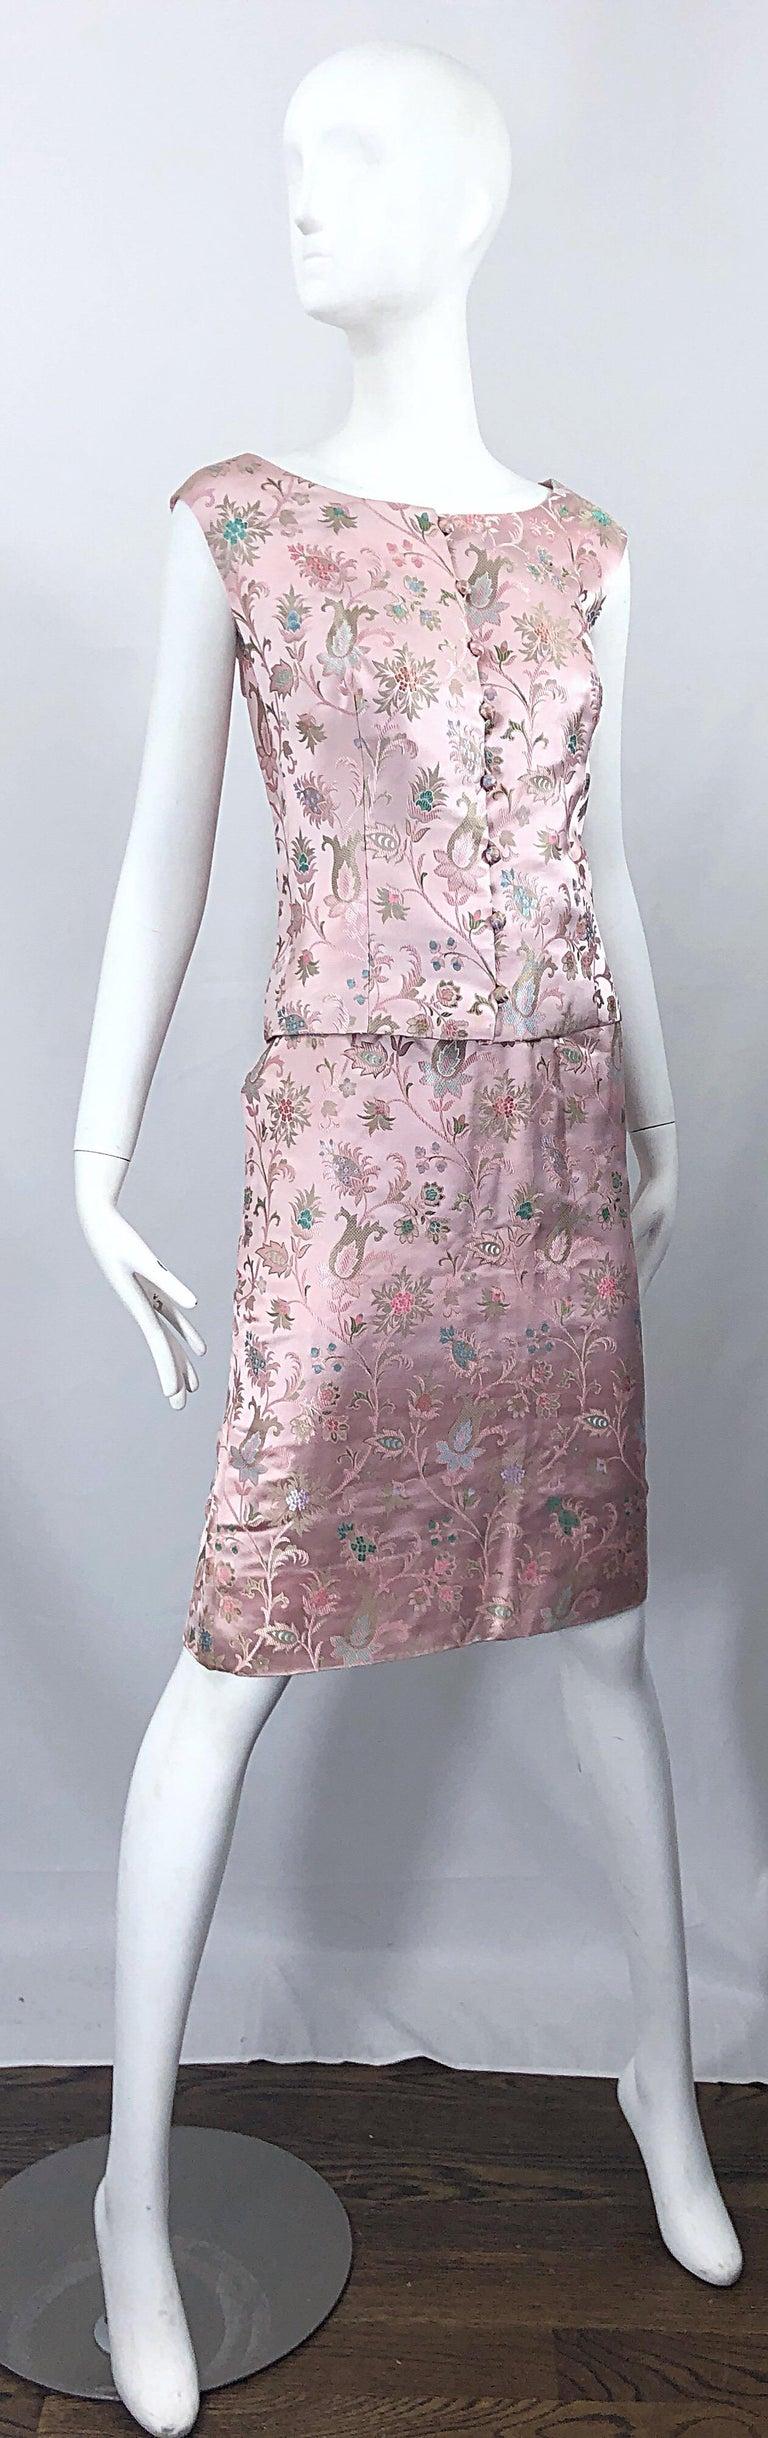 Dynasty 1960s For Lord & Taylor Light Pink Large Size 3 Piece Vintage Dress Set For Sale 9